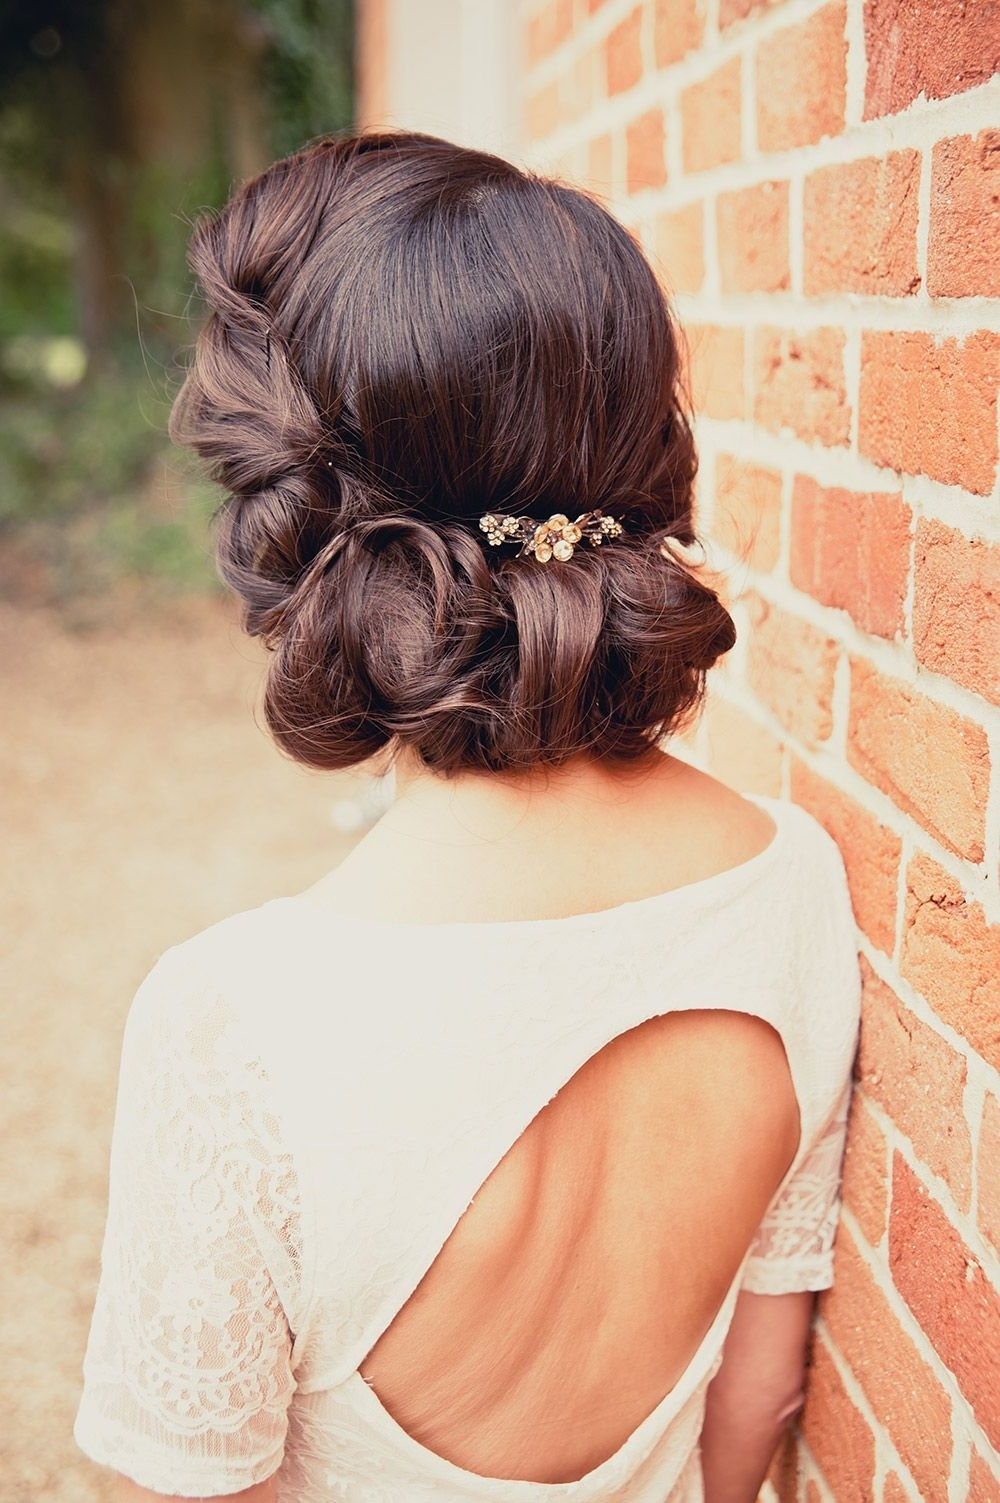 Vintage Wedding Hairstyles (View 2 of 15)